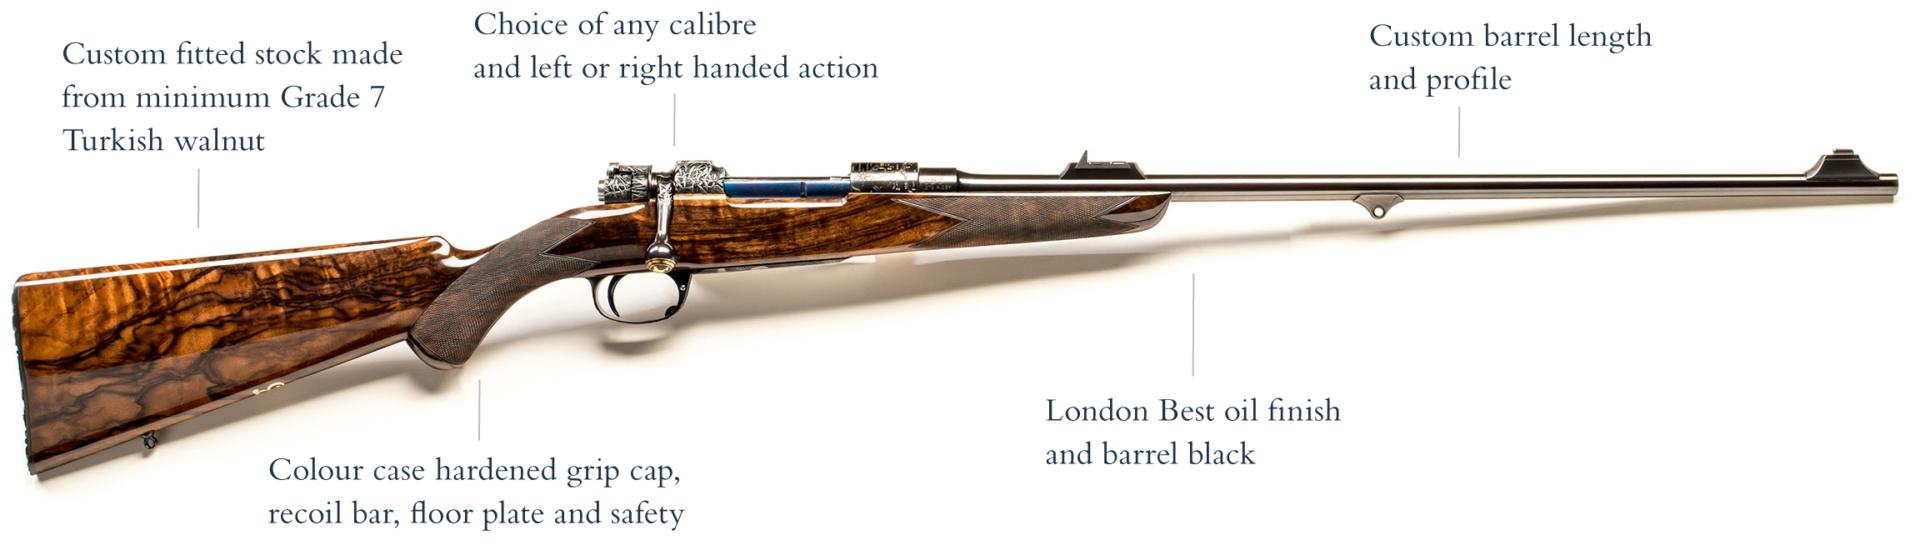 The London Best - John Rigby & Co